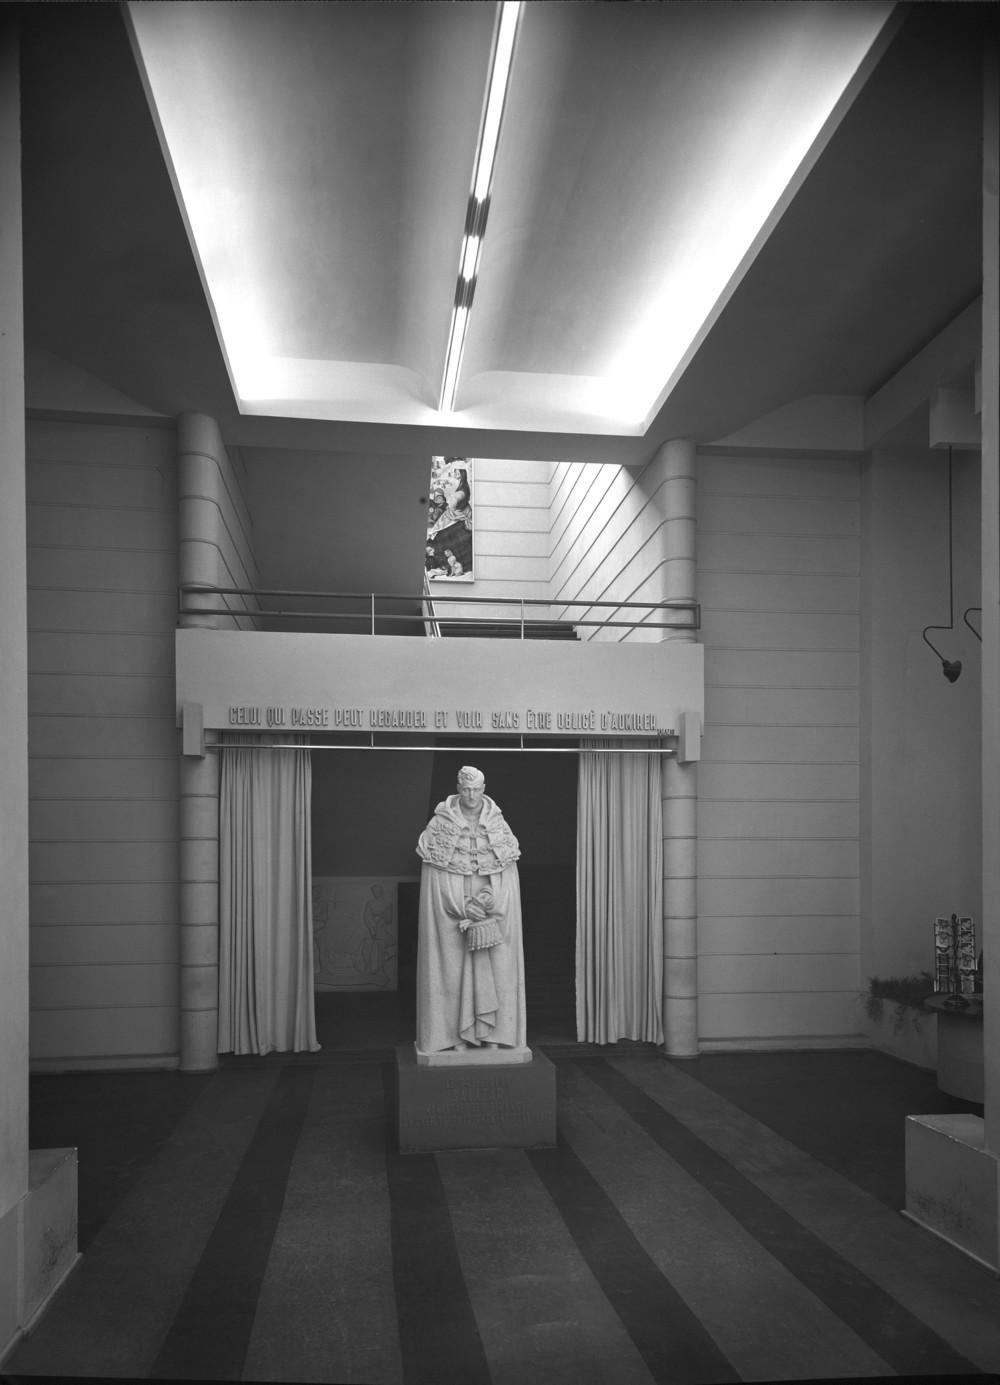 Statue of Salazar, 1937 CFT003_102354